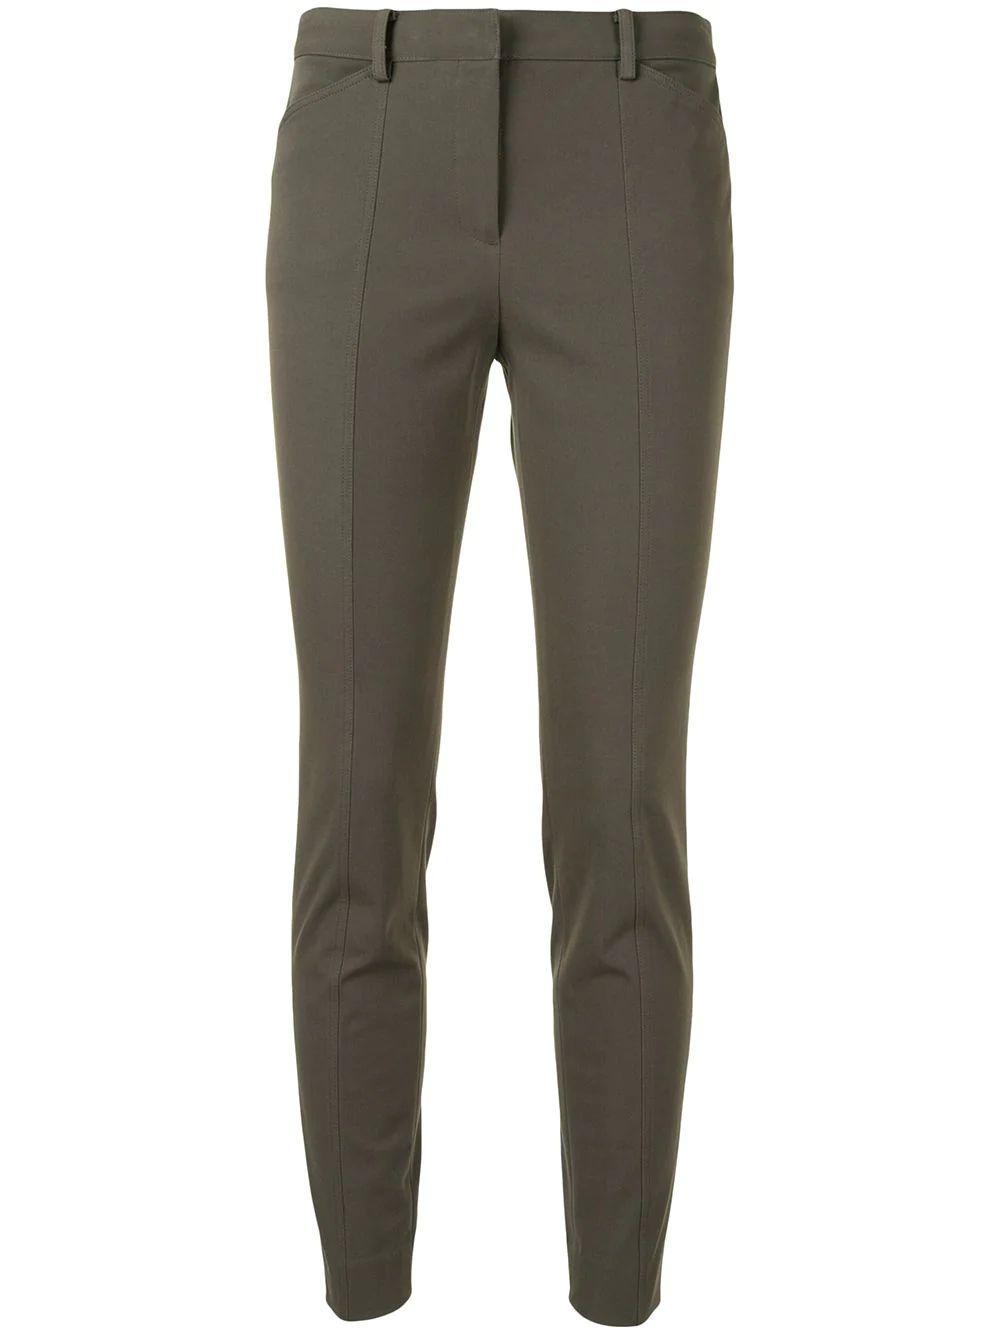 Twill Front Seam Trouser Item # K0704206